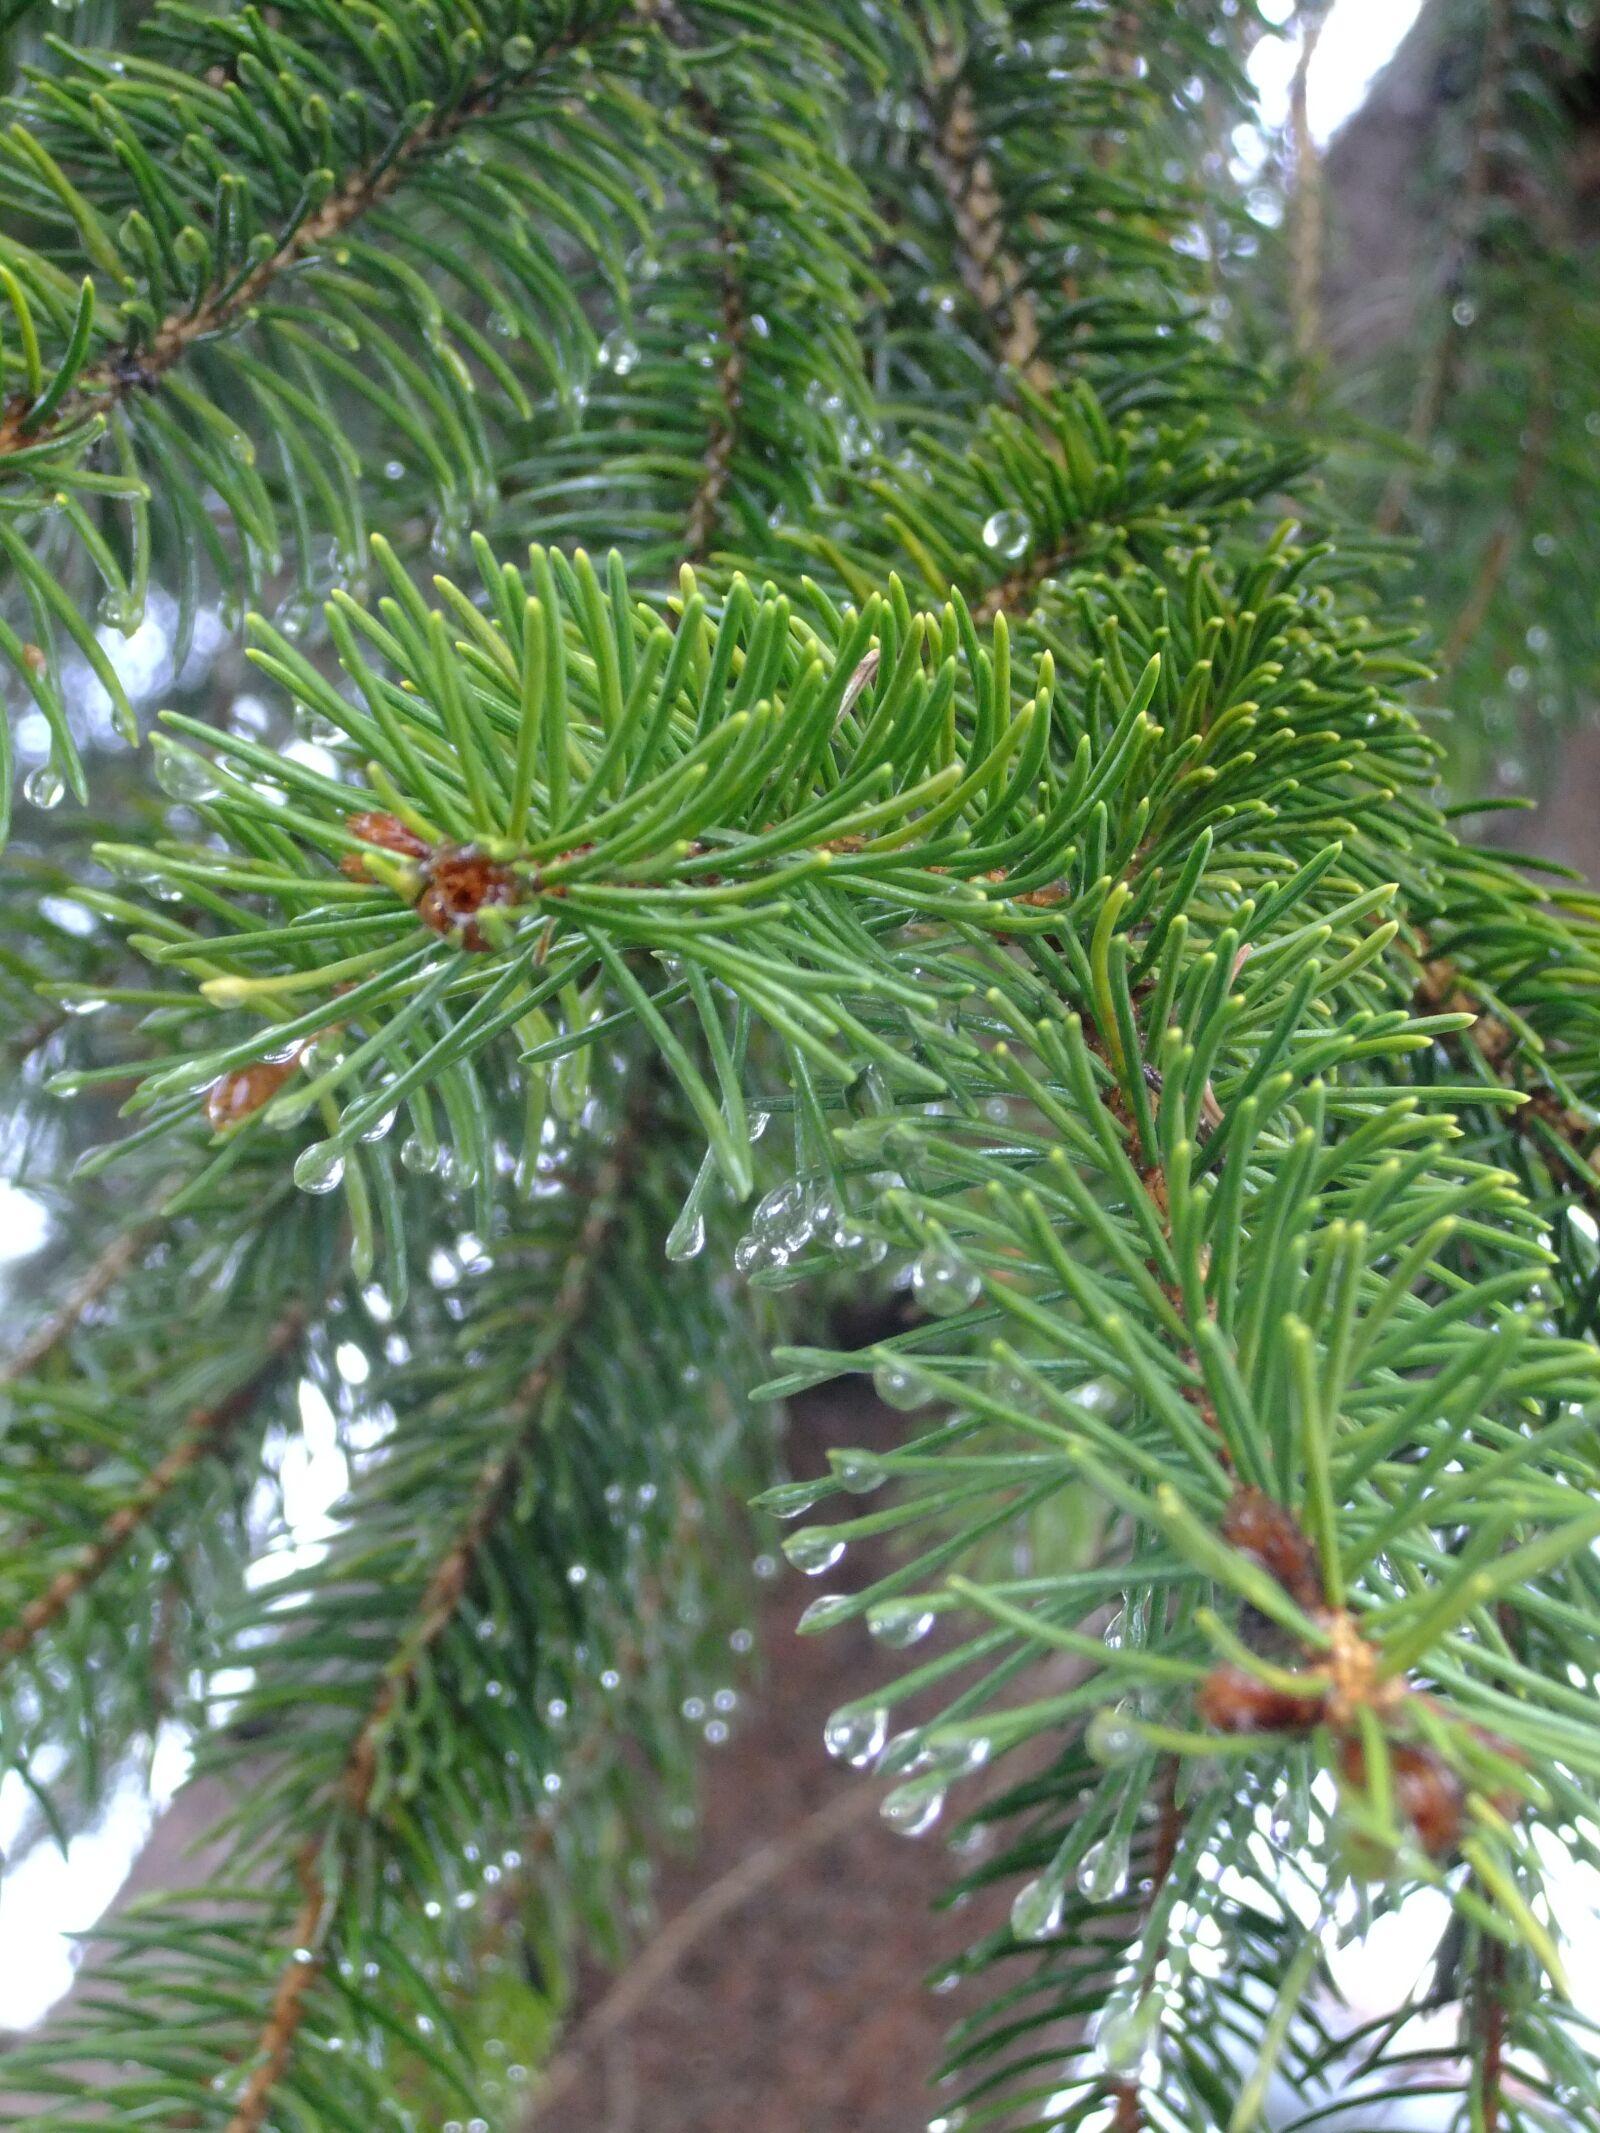 "FujiFilm FinePix JZ500 (FinePix JZ505) sample photo. ""Nature, pine, drop"" photography"